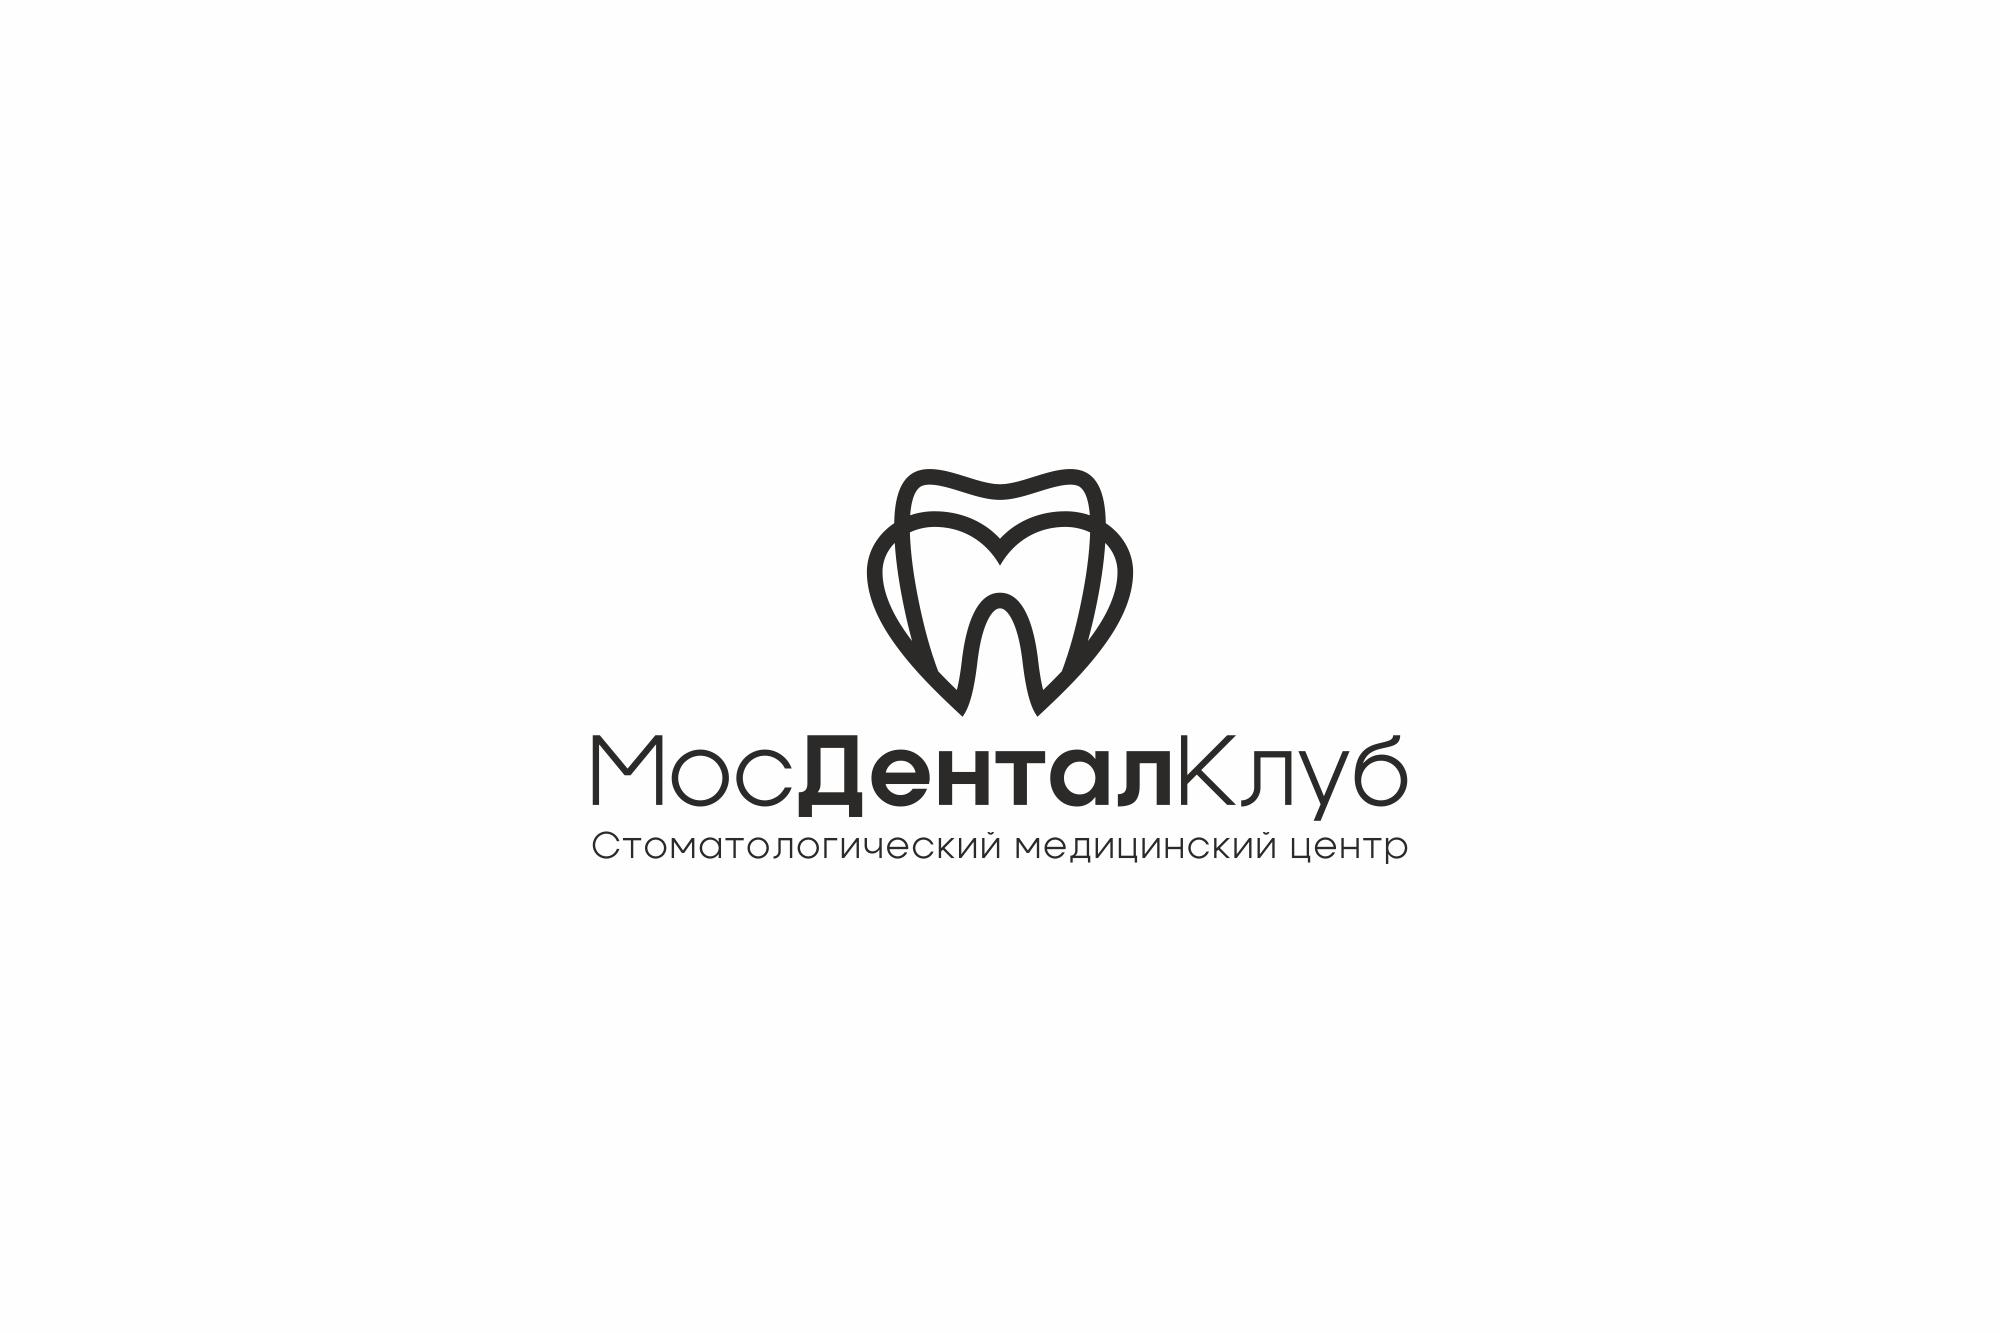 Разработка логотипа стоматологического медицинского центра фото f_3385e4eb02689d0e.jpg